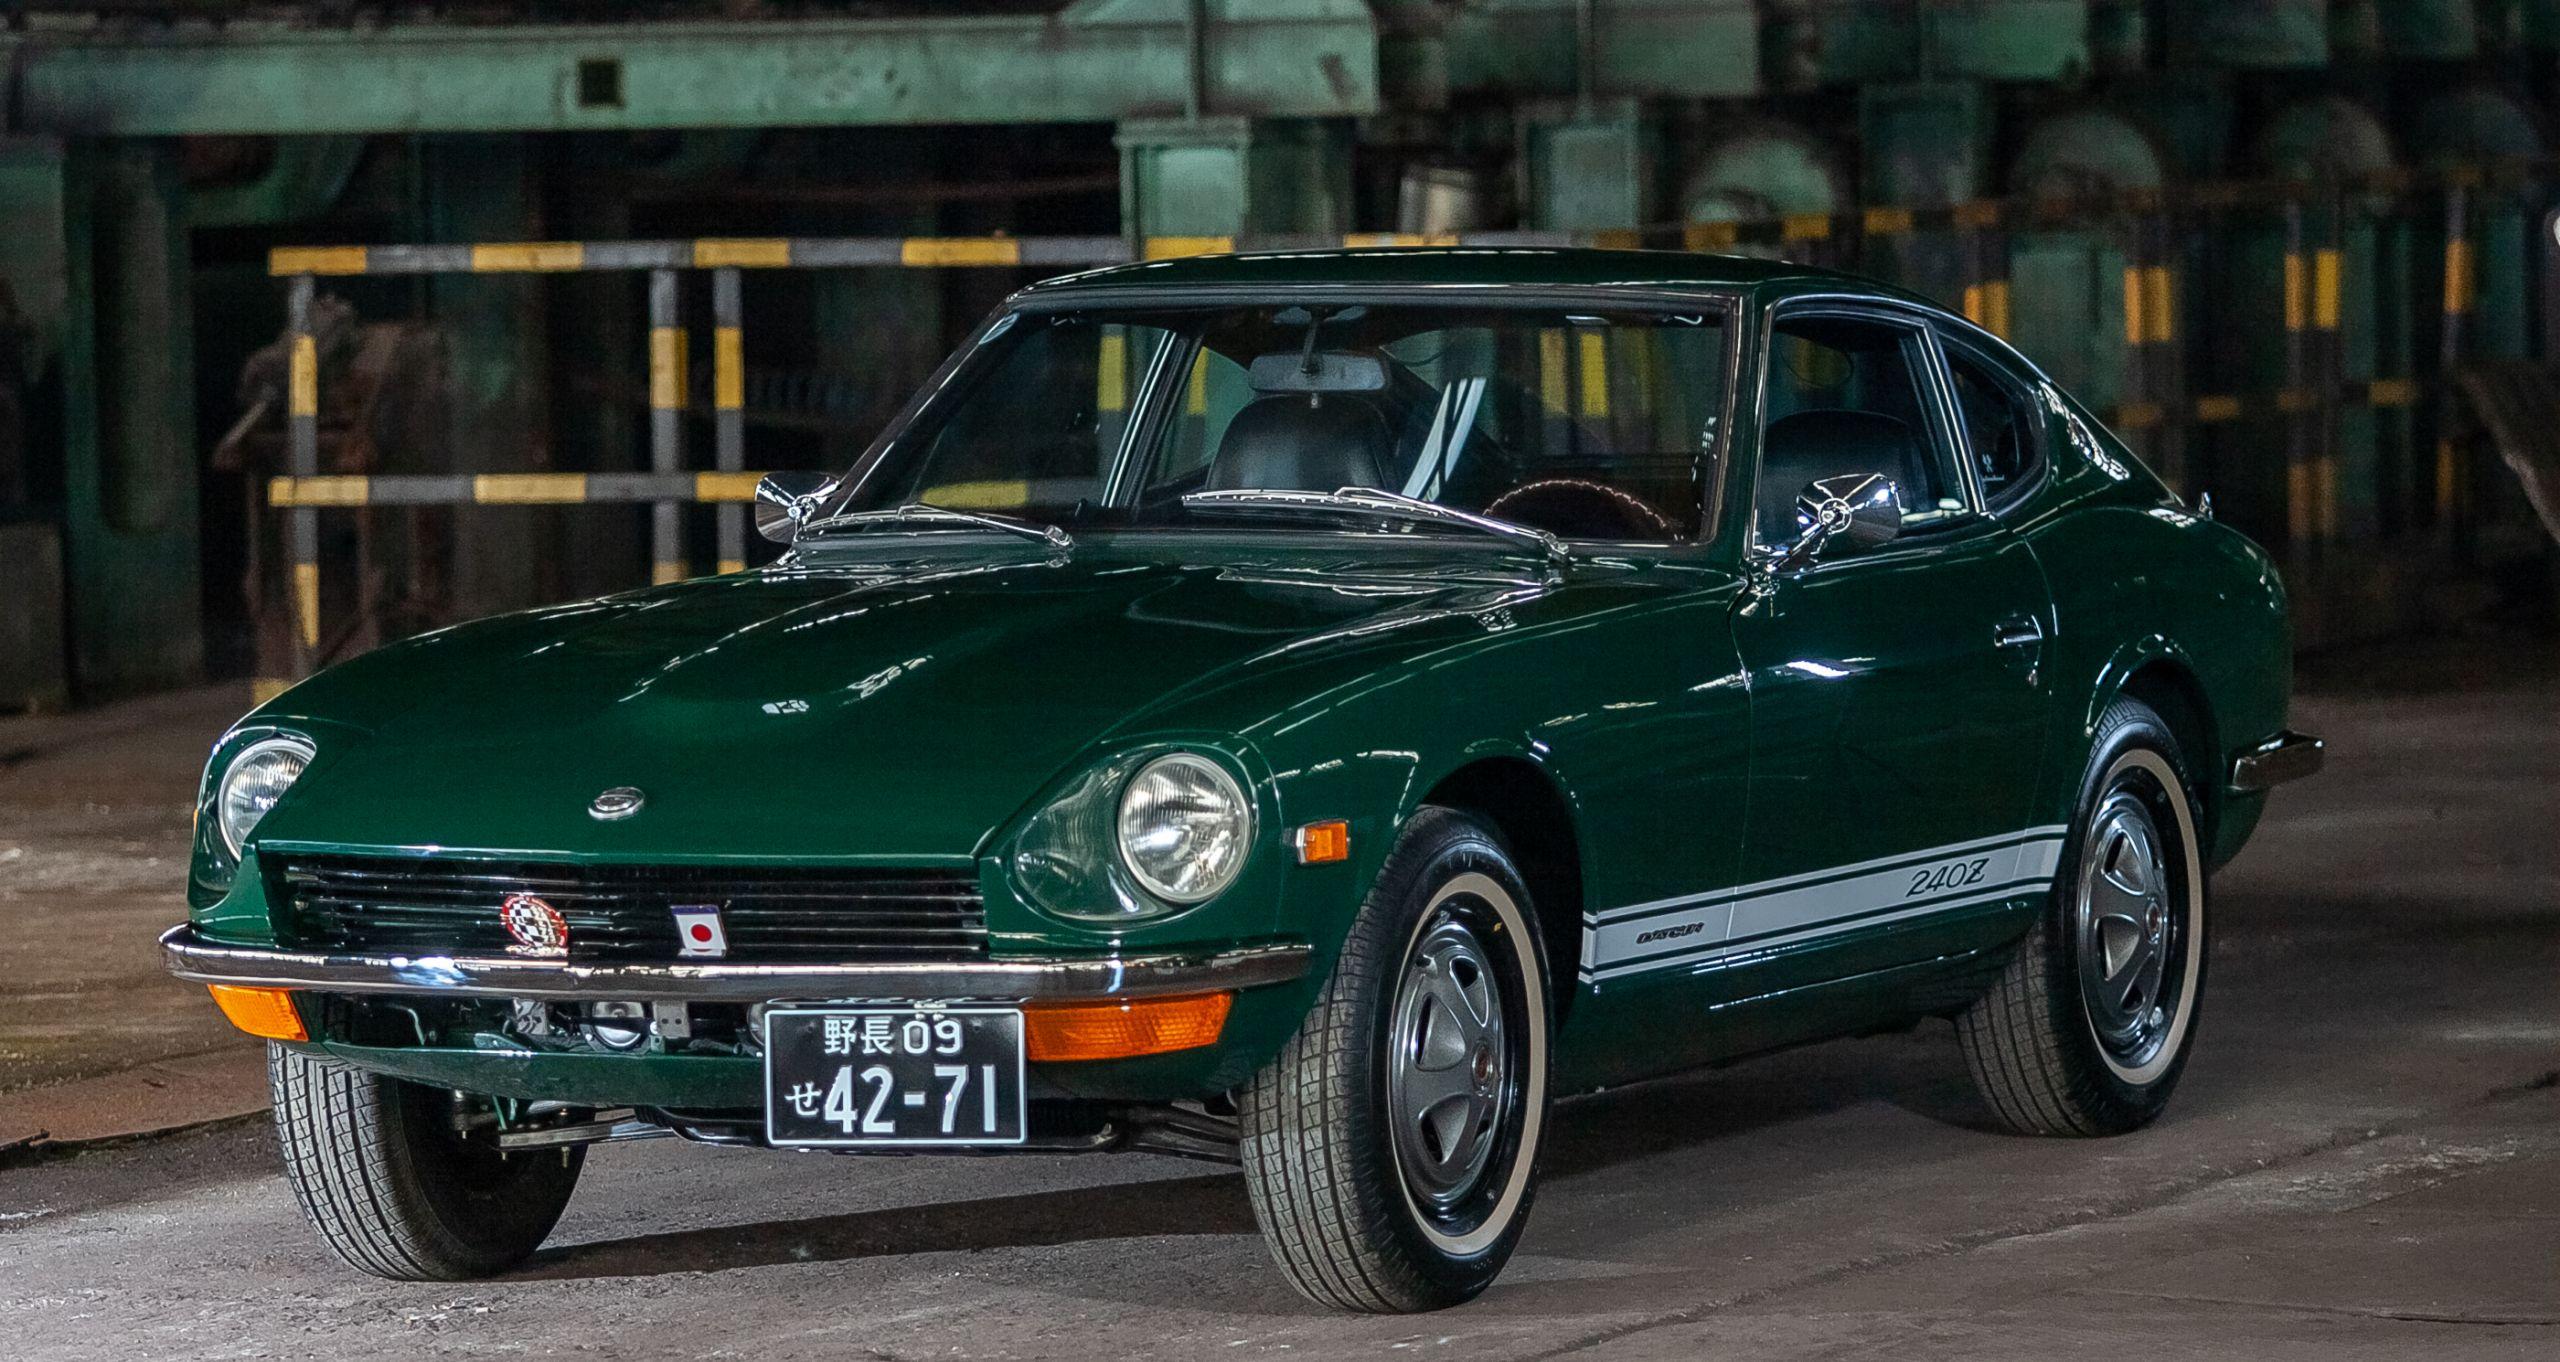 Totally restored Green Datsun 240z for sale